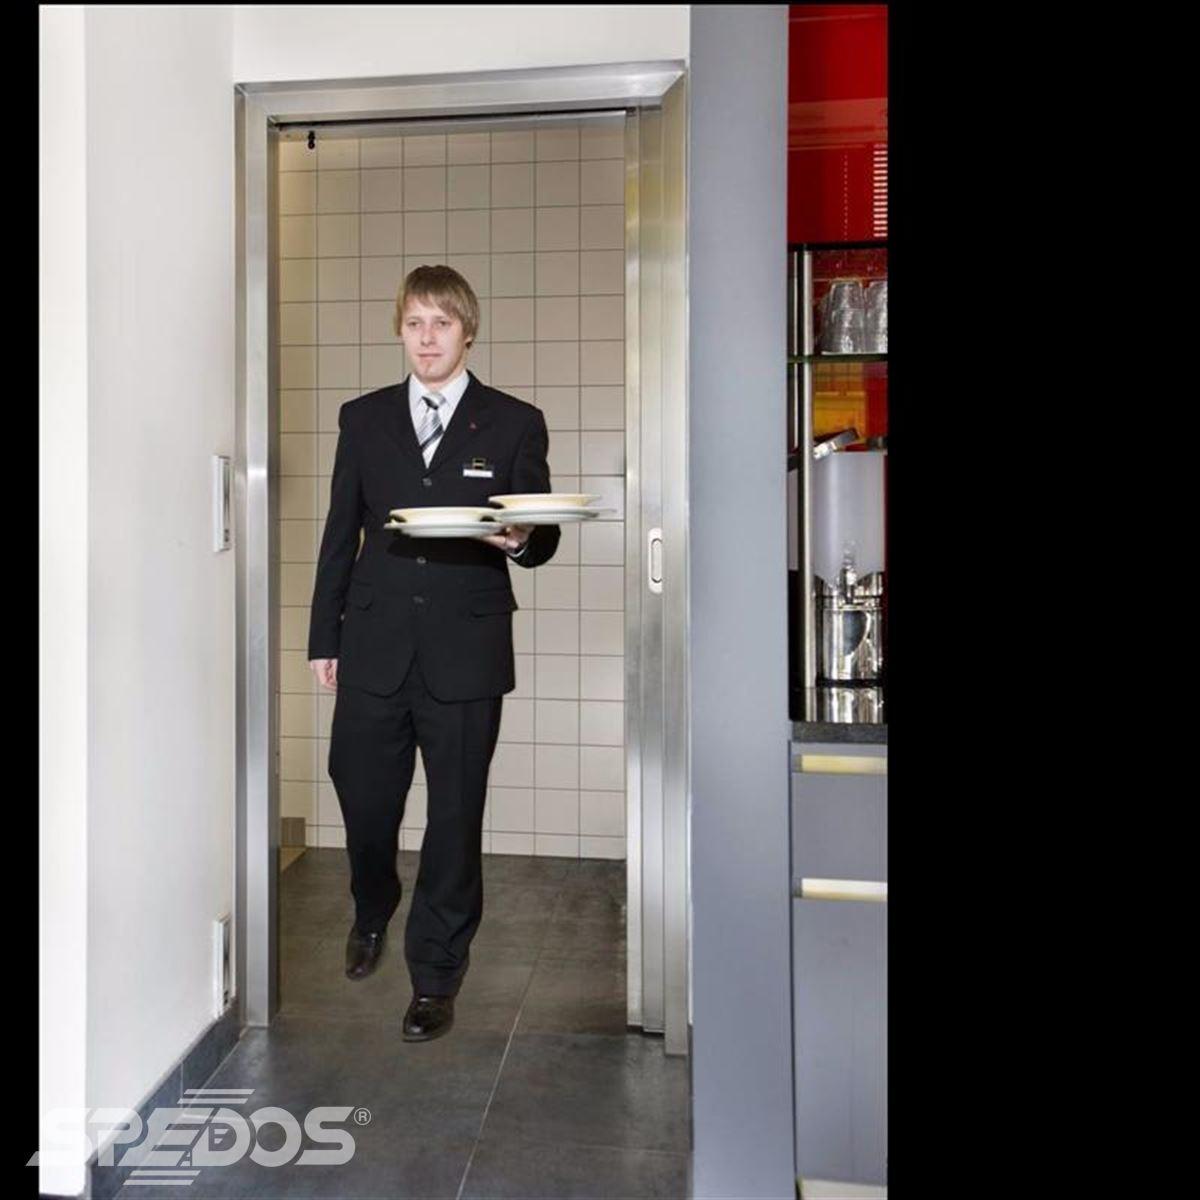 jednokřídlé automatické dvere posuvné v nerezu 2